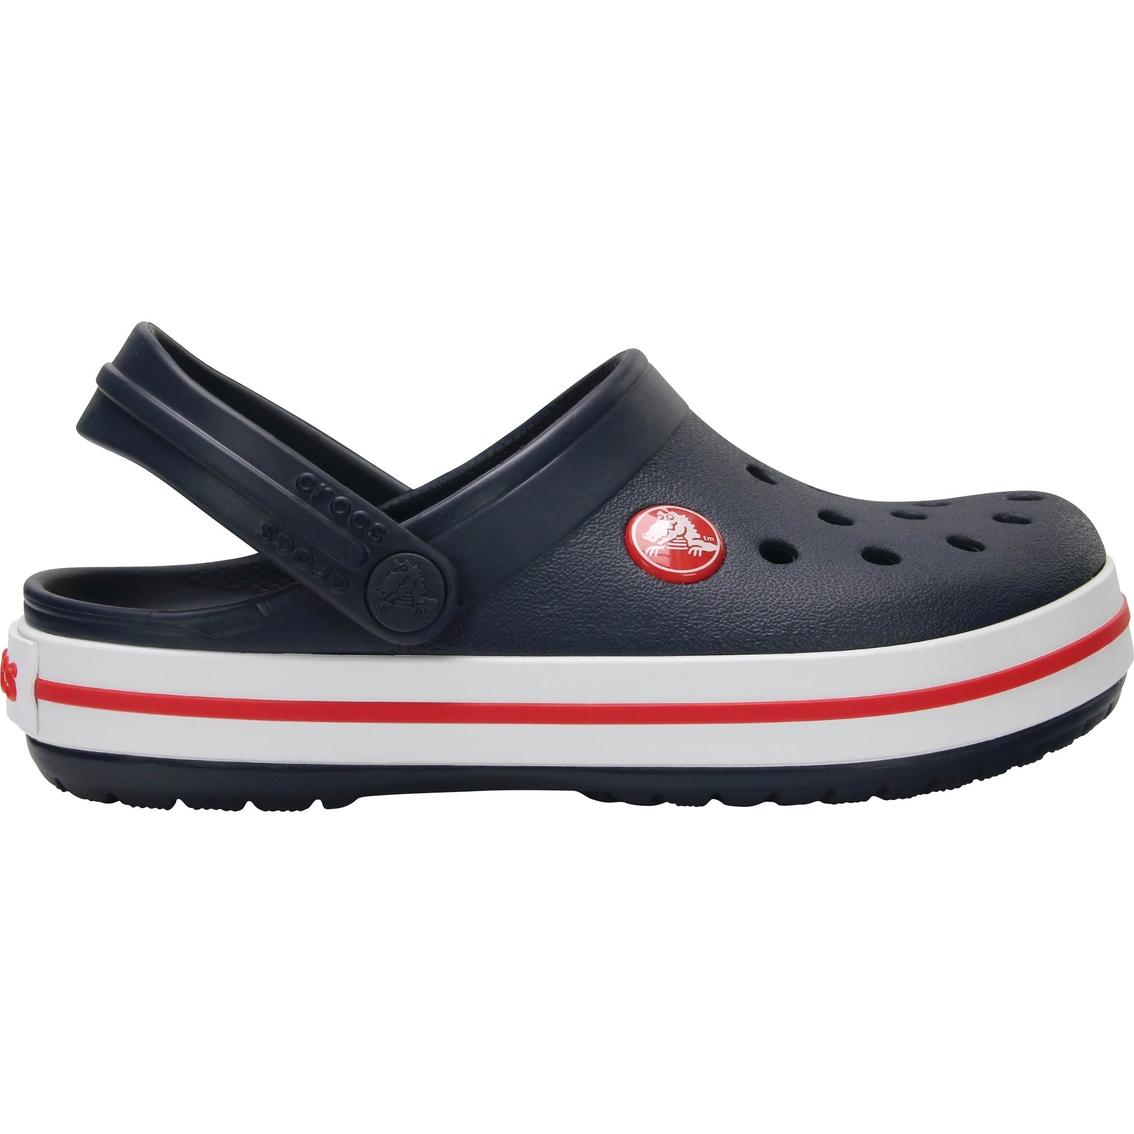 Crocs Toddler Boys Crocband Clogs  c944ba8a3c4b